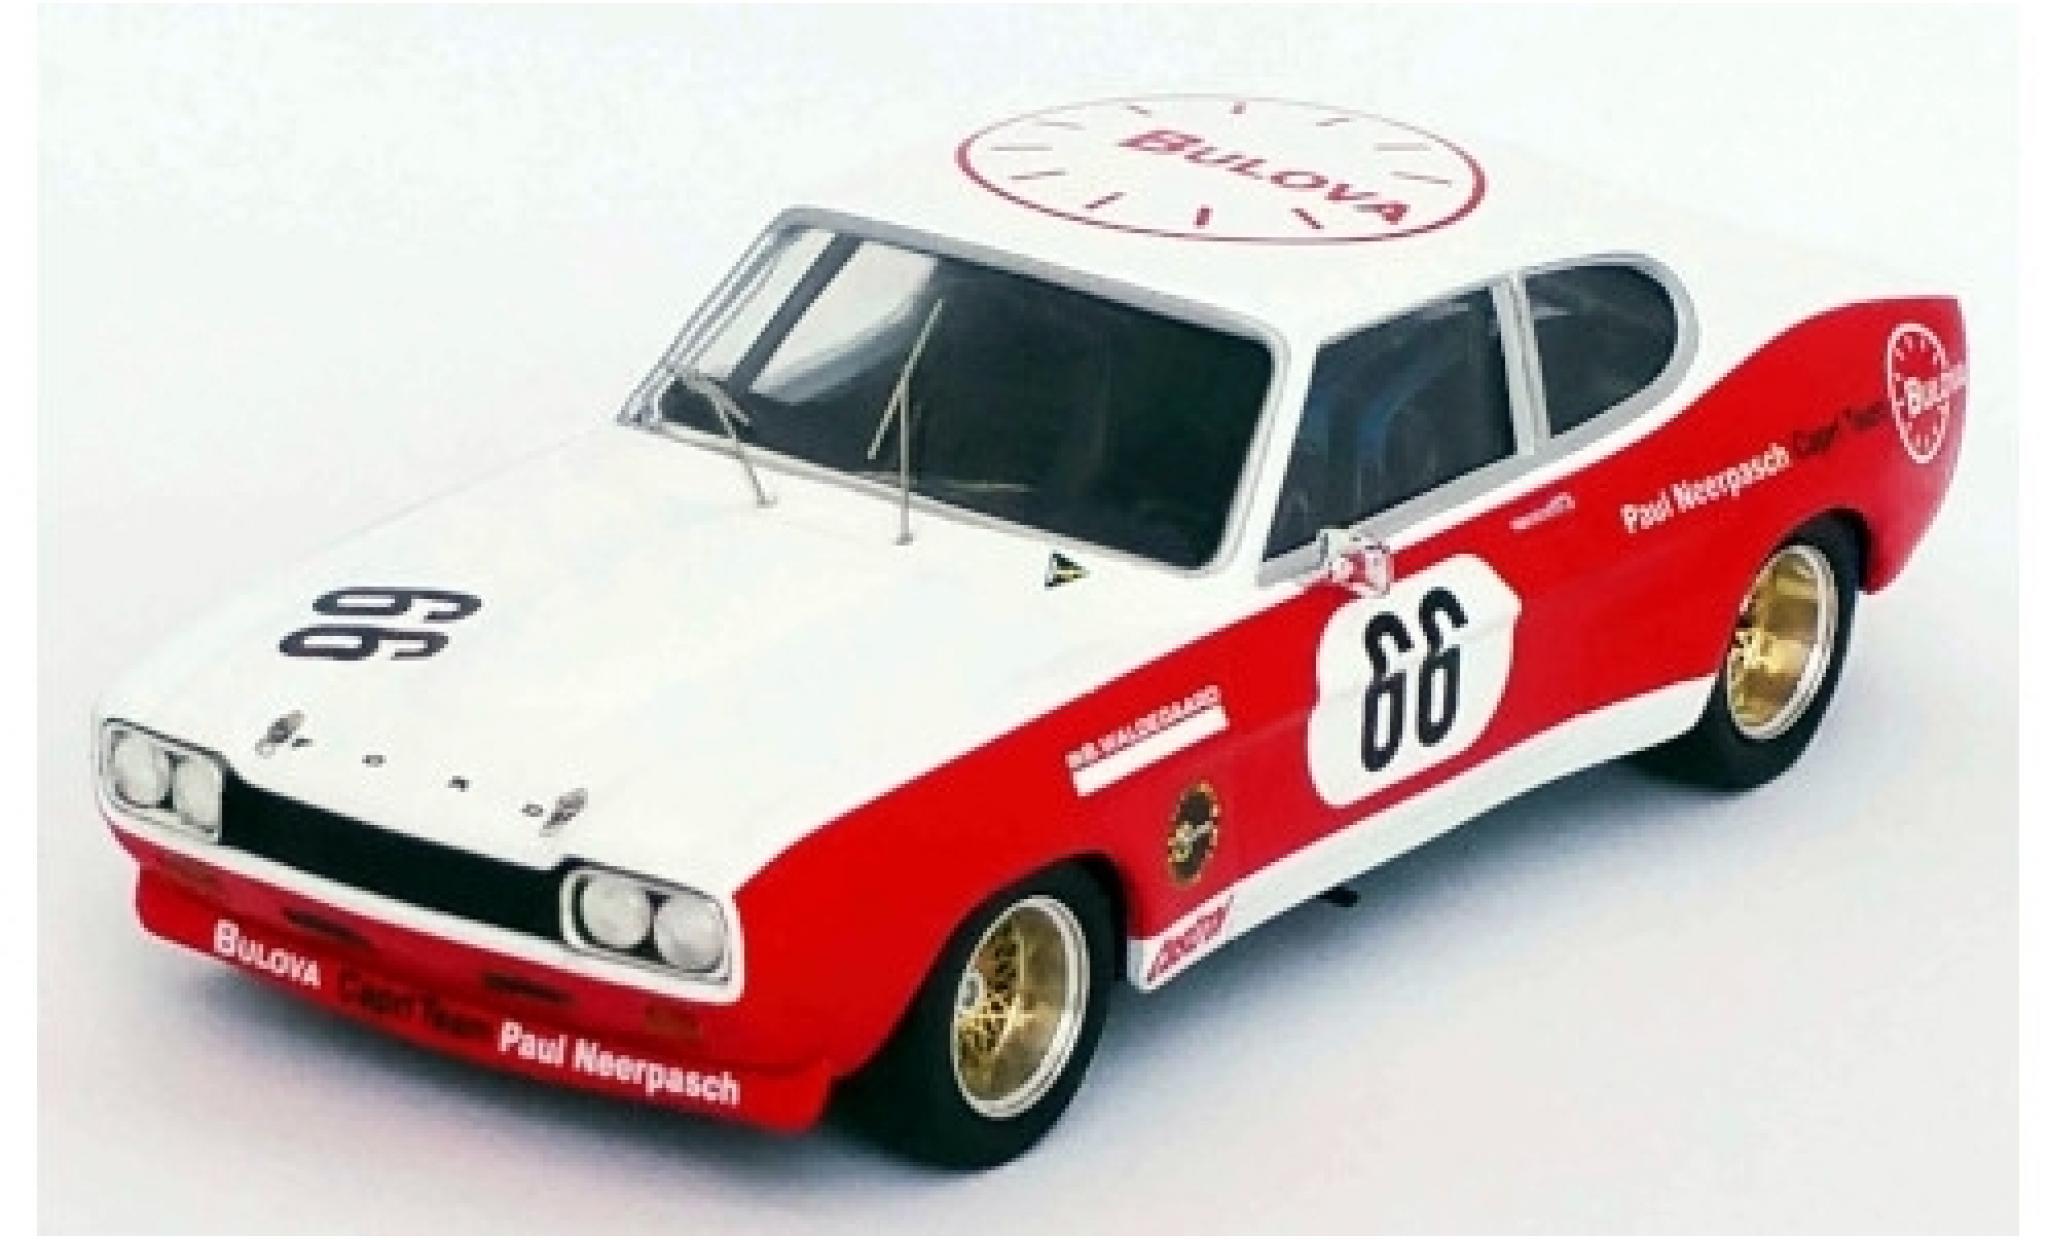 Ford Capri 1/43 Trofeu MK I RS 2600 No.66 Bulova Team Paul Neerpasch Bulova DRM 500 Km Nürburgring 1972 B.Waldegaard